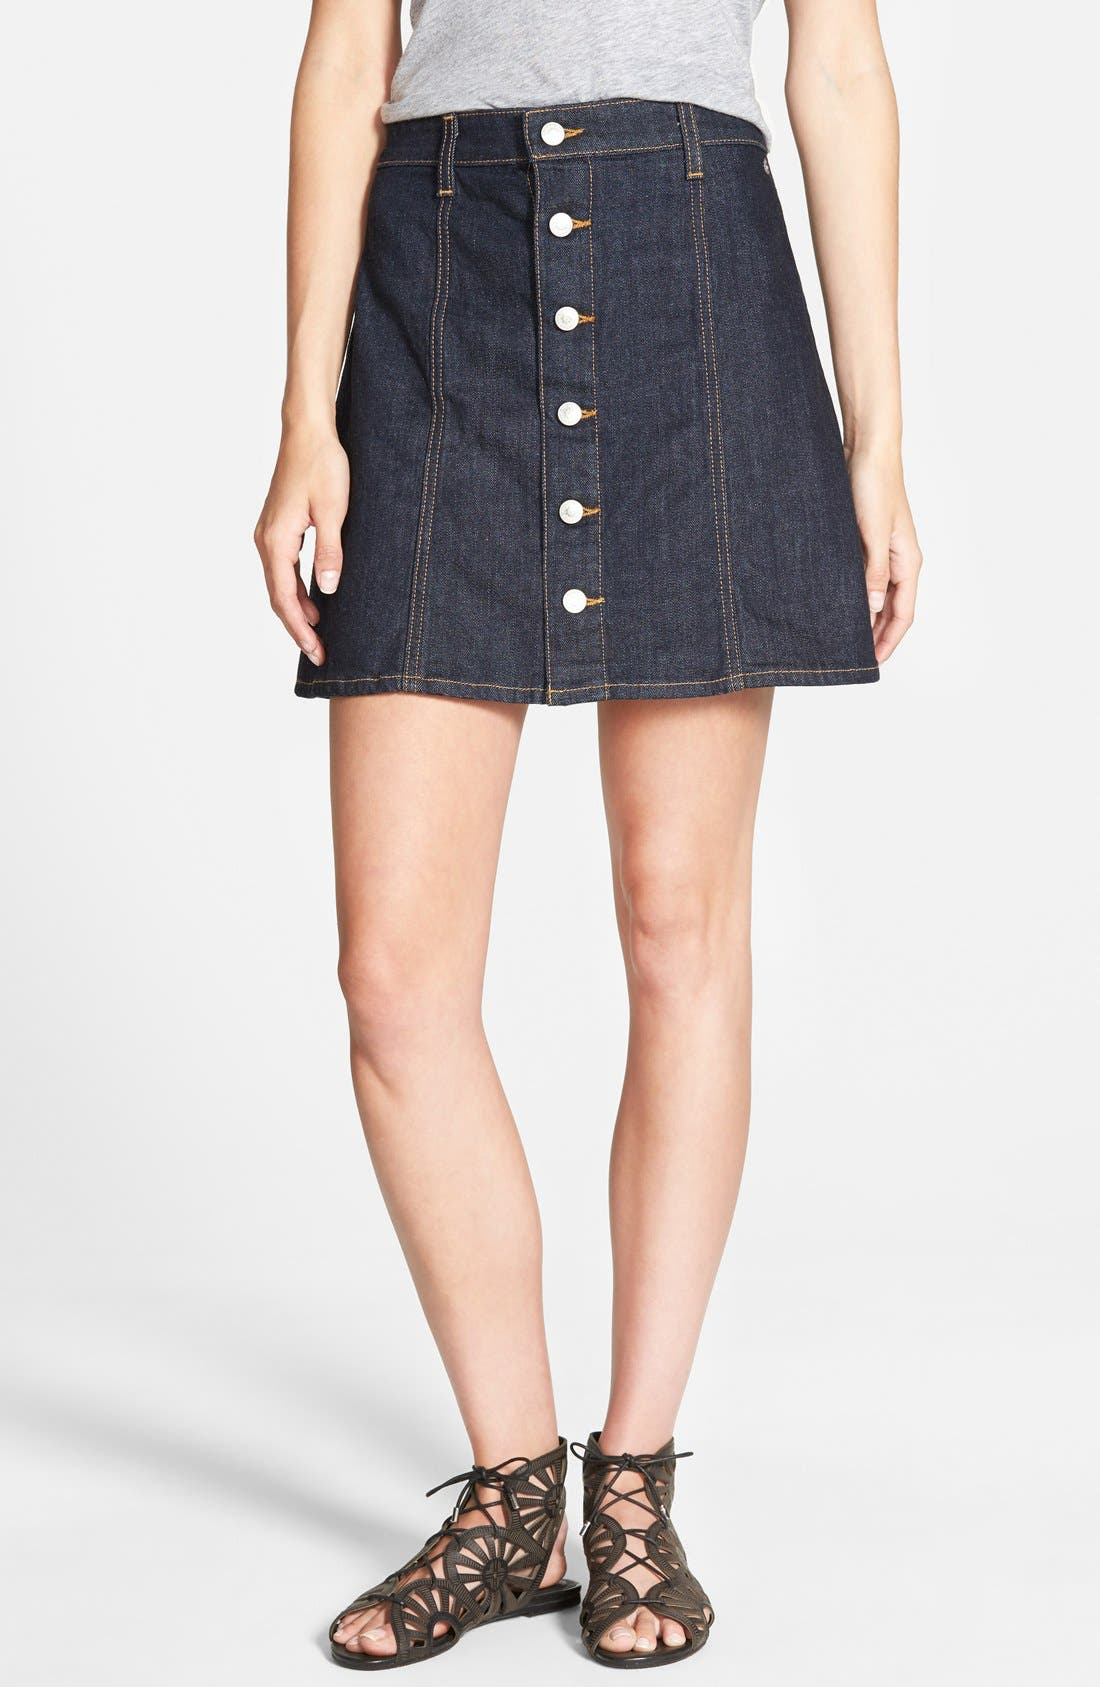 Main Image - Alexa Chung for AG 'The Kety' A-Line Denim Skirt (Loan Star)